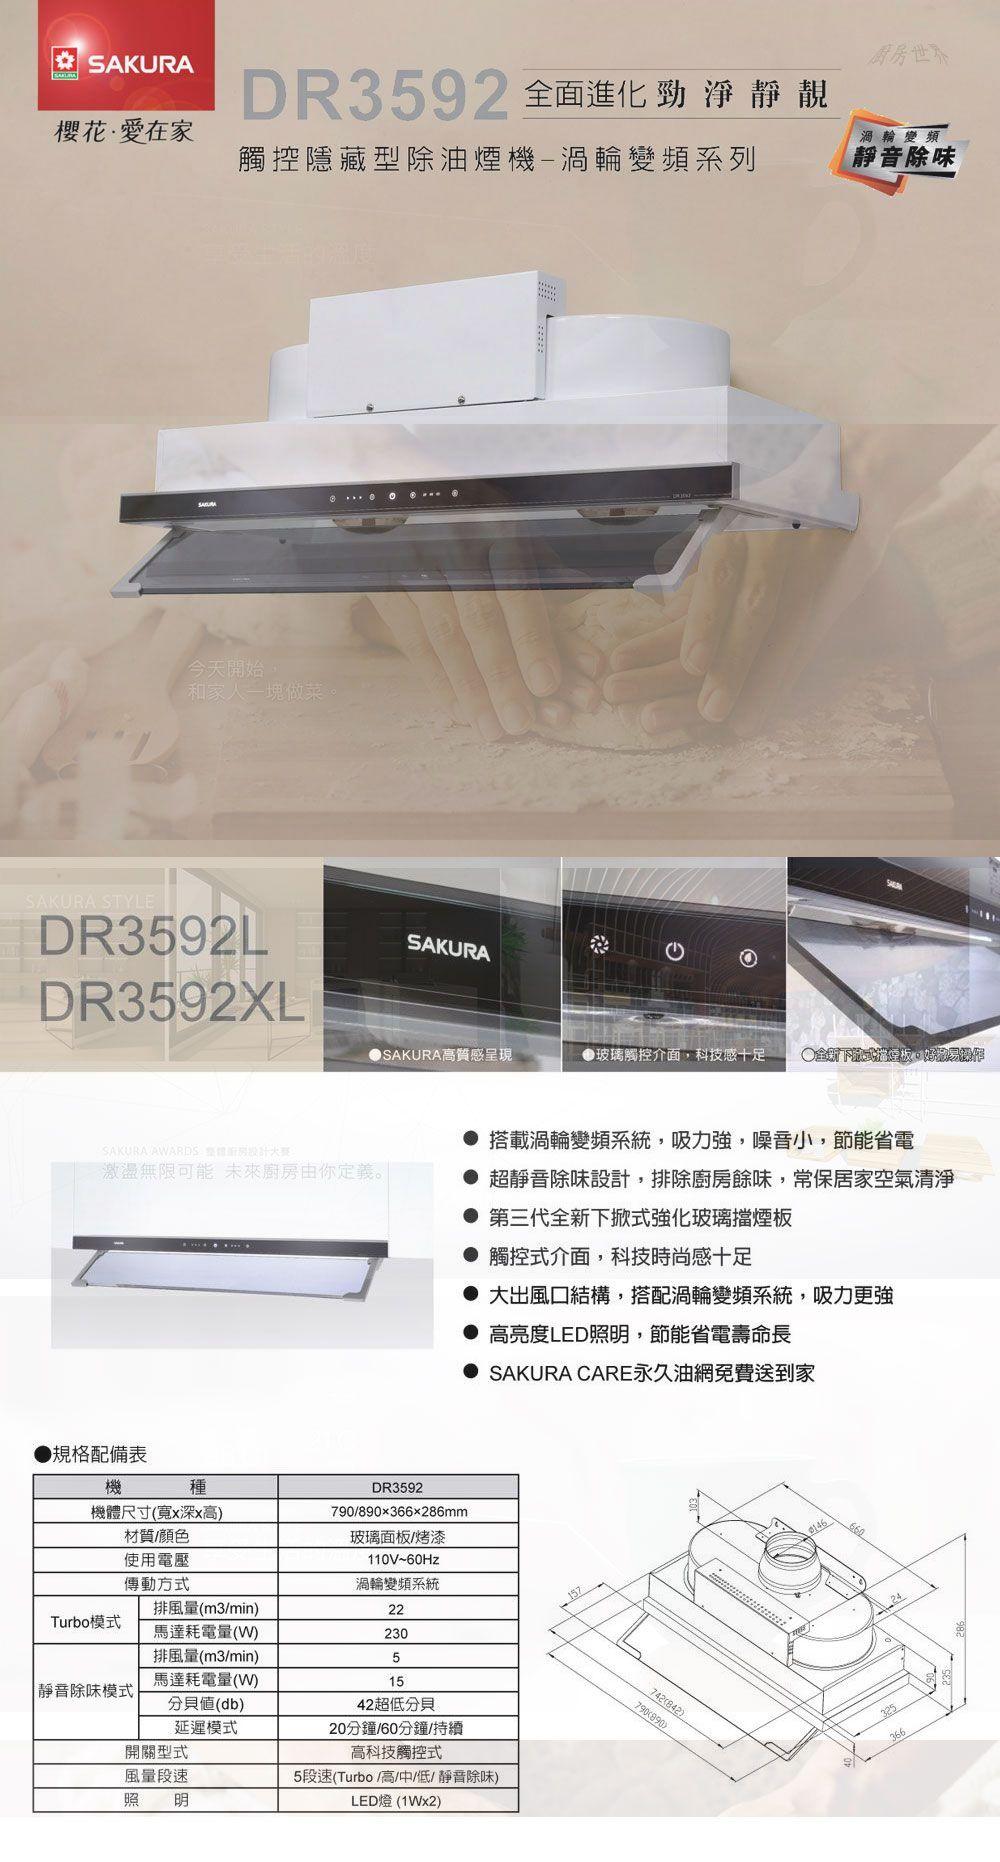 PK/goods/SAKURA/Hood/DR3592A-DM-1.jpg